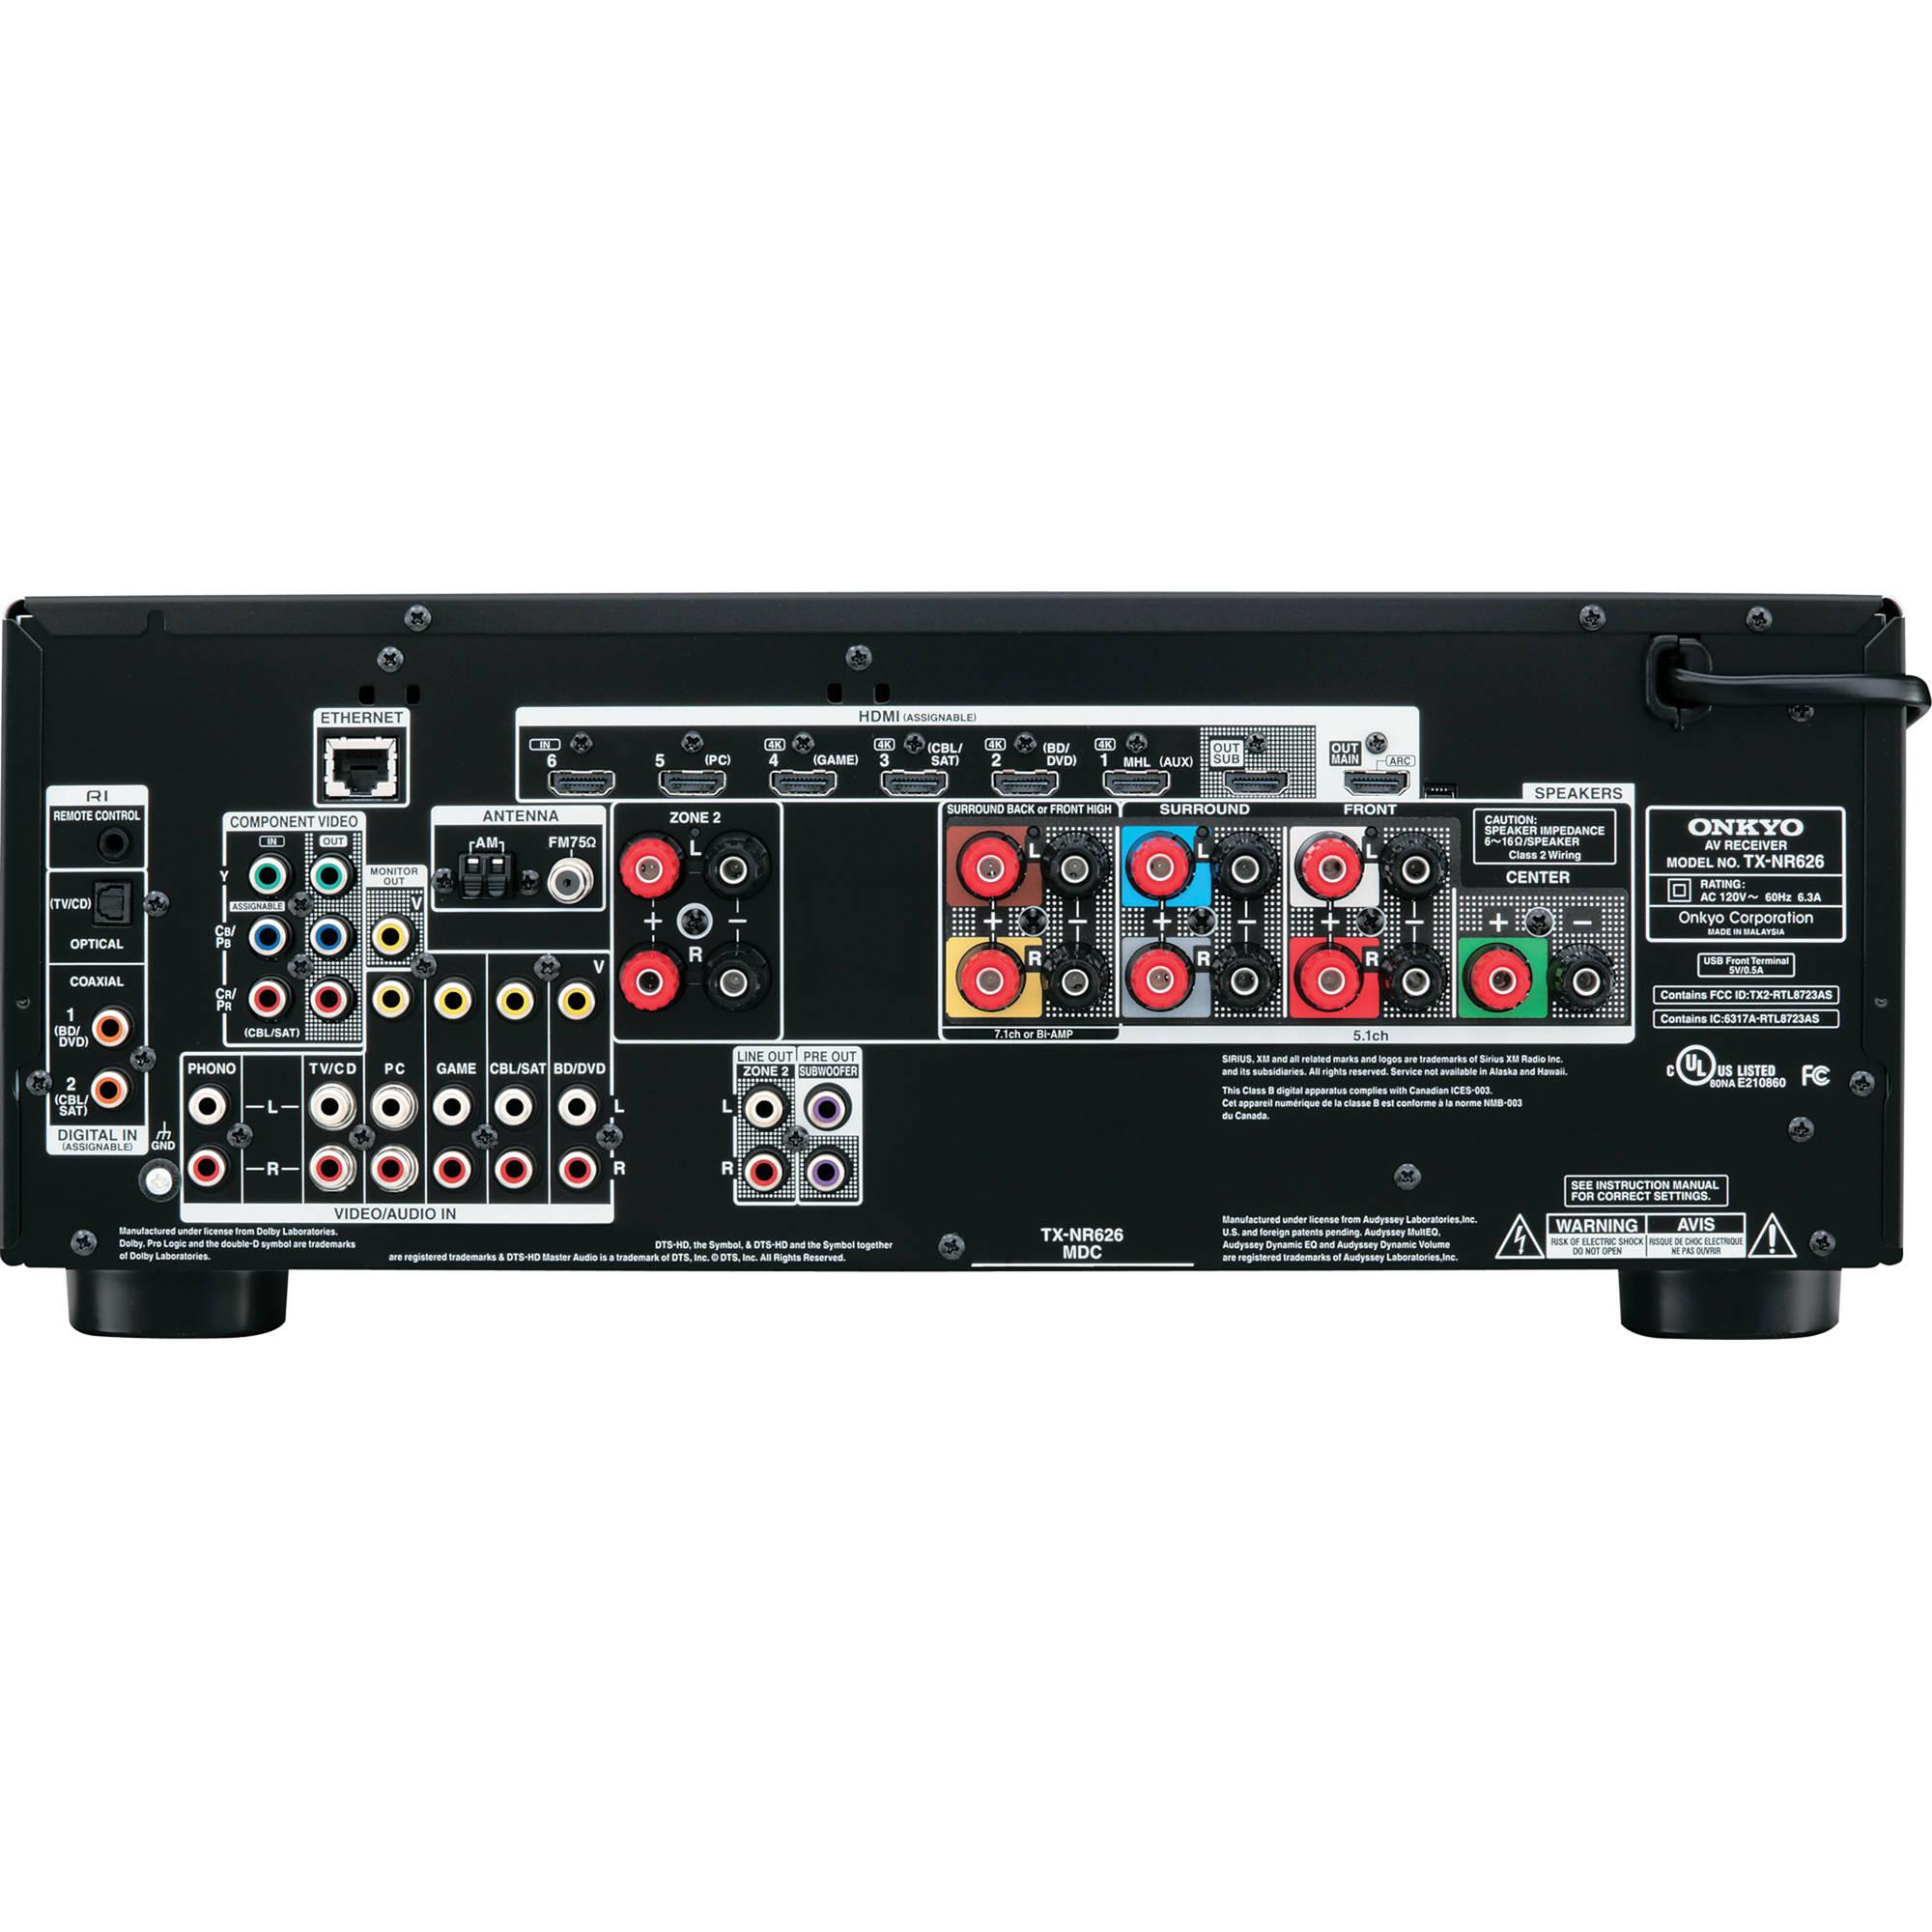 Onkyo TX-NR626 7 2-Channel Network A/V Receiver